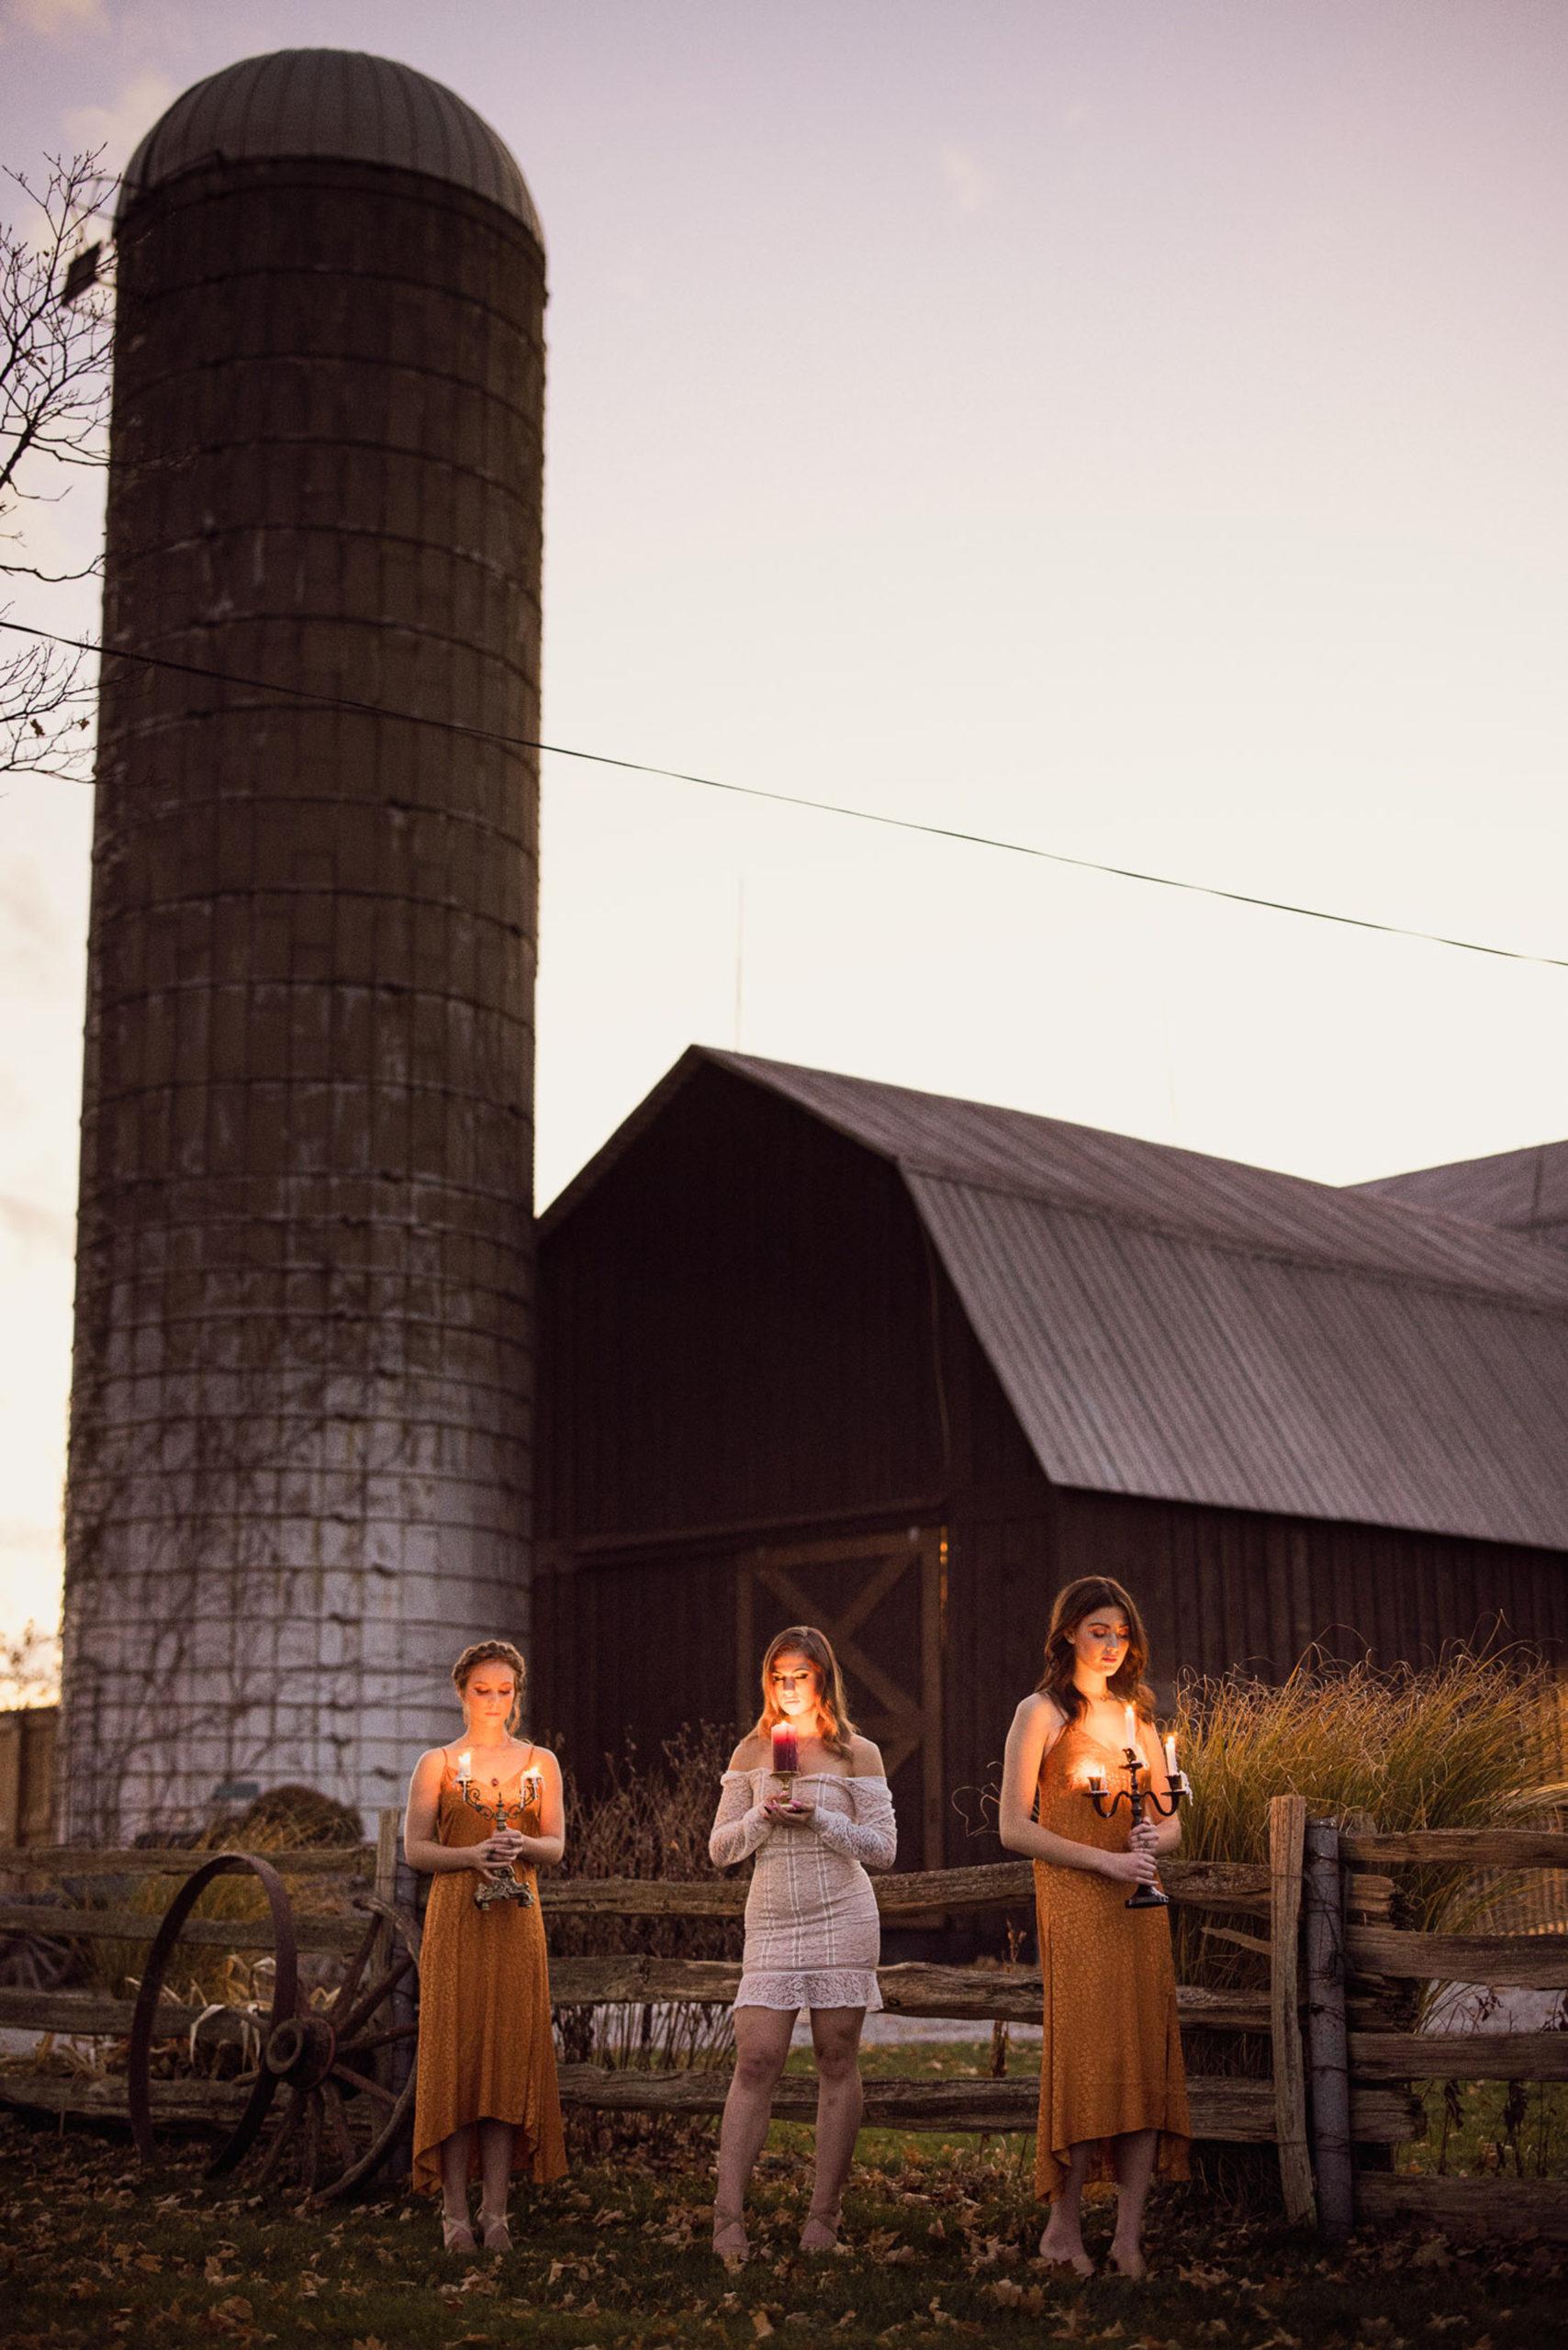 goodnight at maple meadows farm silo barn wedding niagara afterglow images